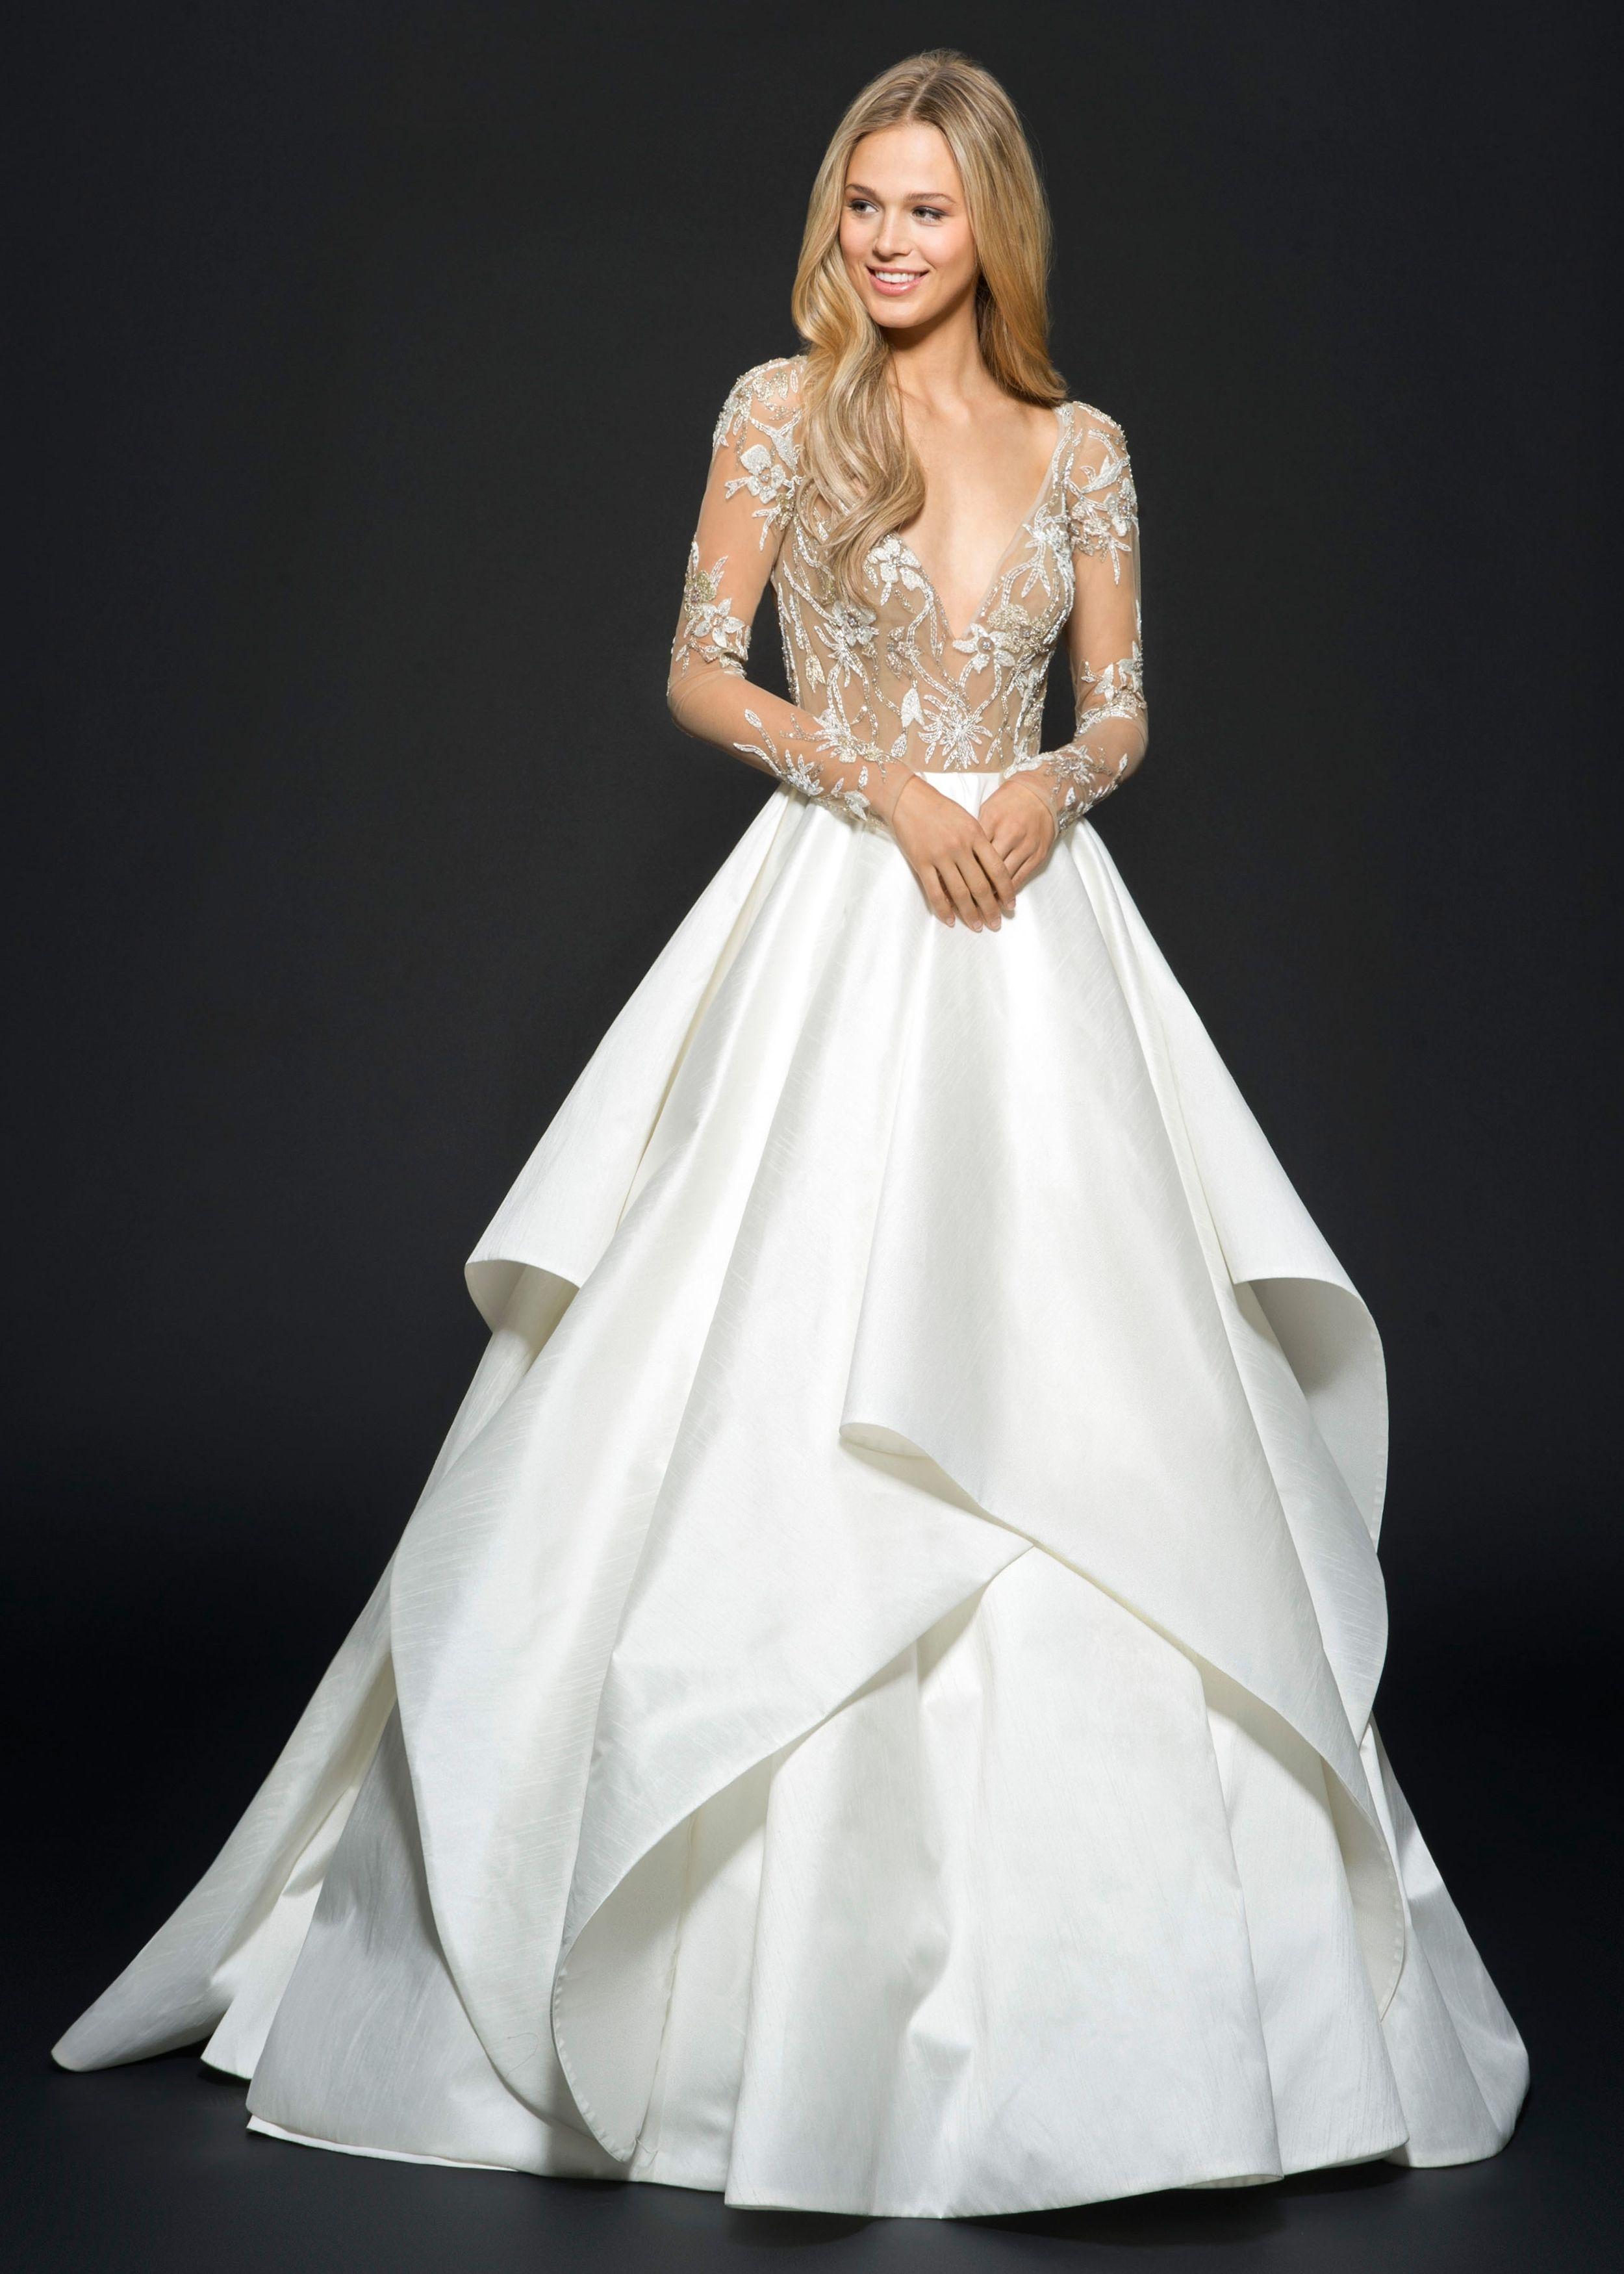 Chantelle Houghton Wedding Dress Wedding Dresses Sleeve Wedding Dress Dresses